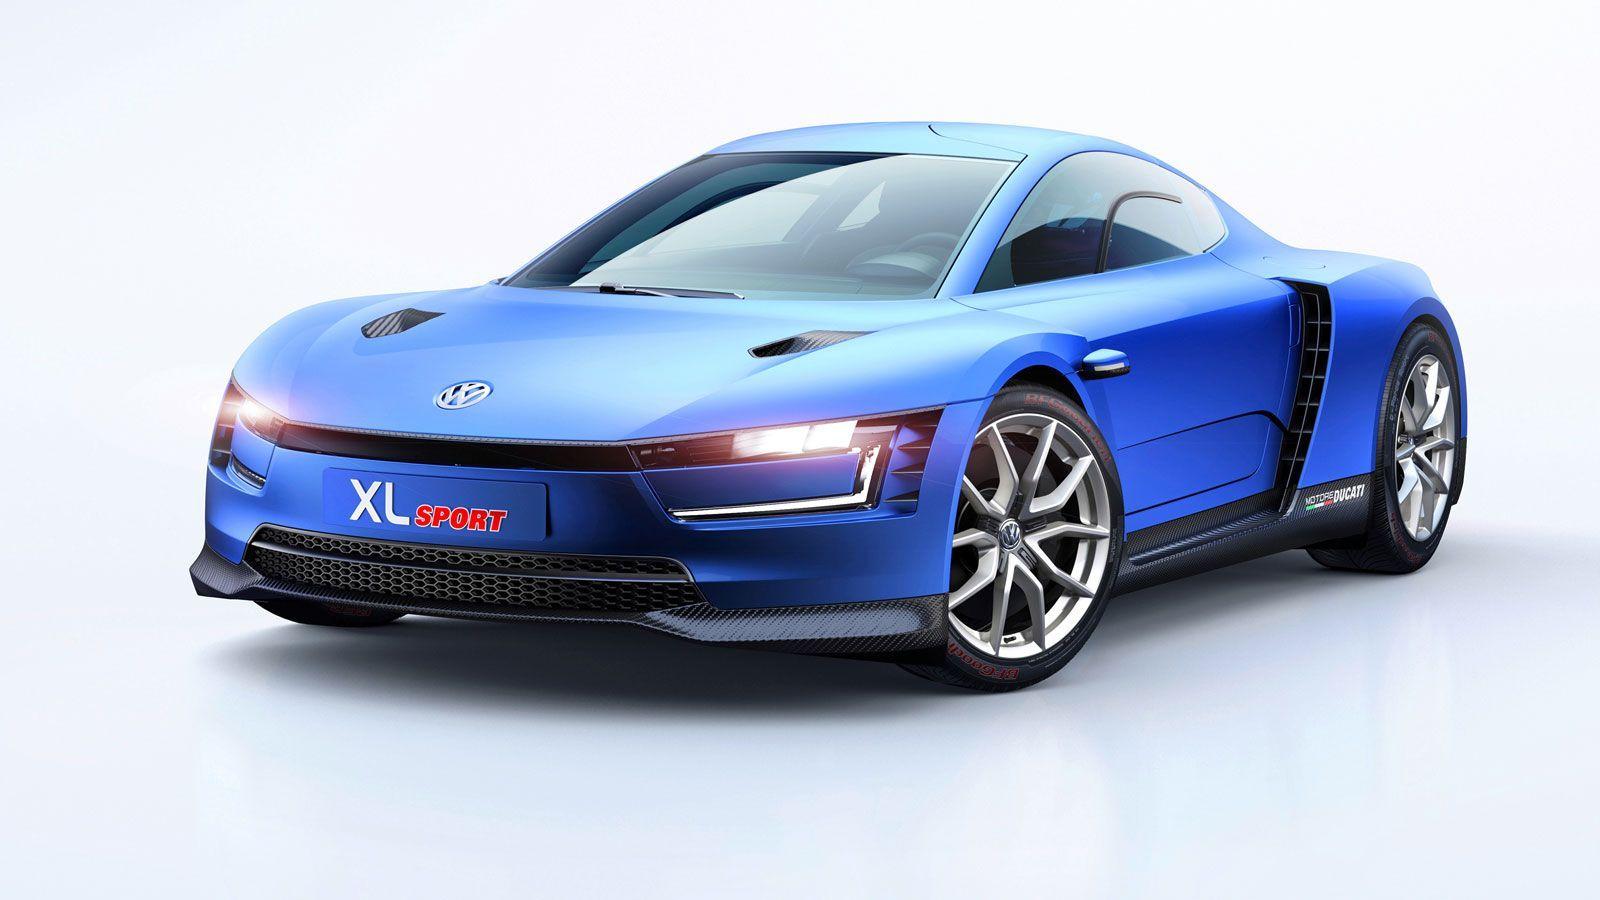 Volkswagen XL Sport Is The Most Powerful TwoCylinder Car